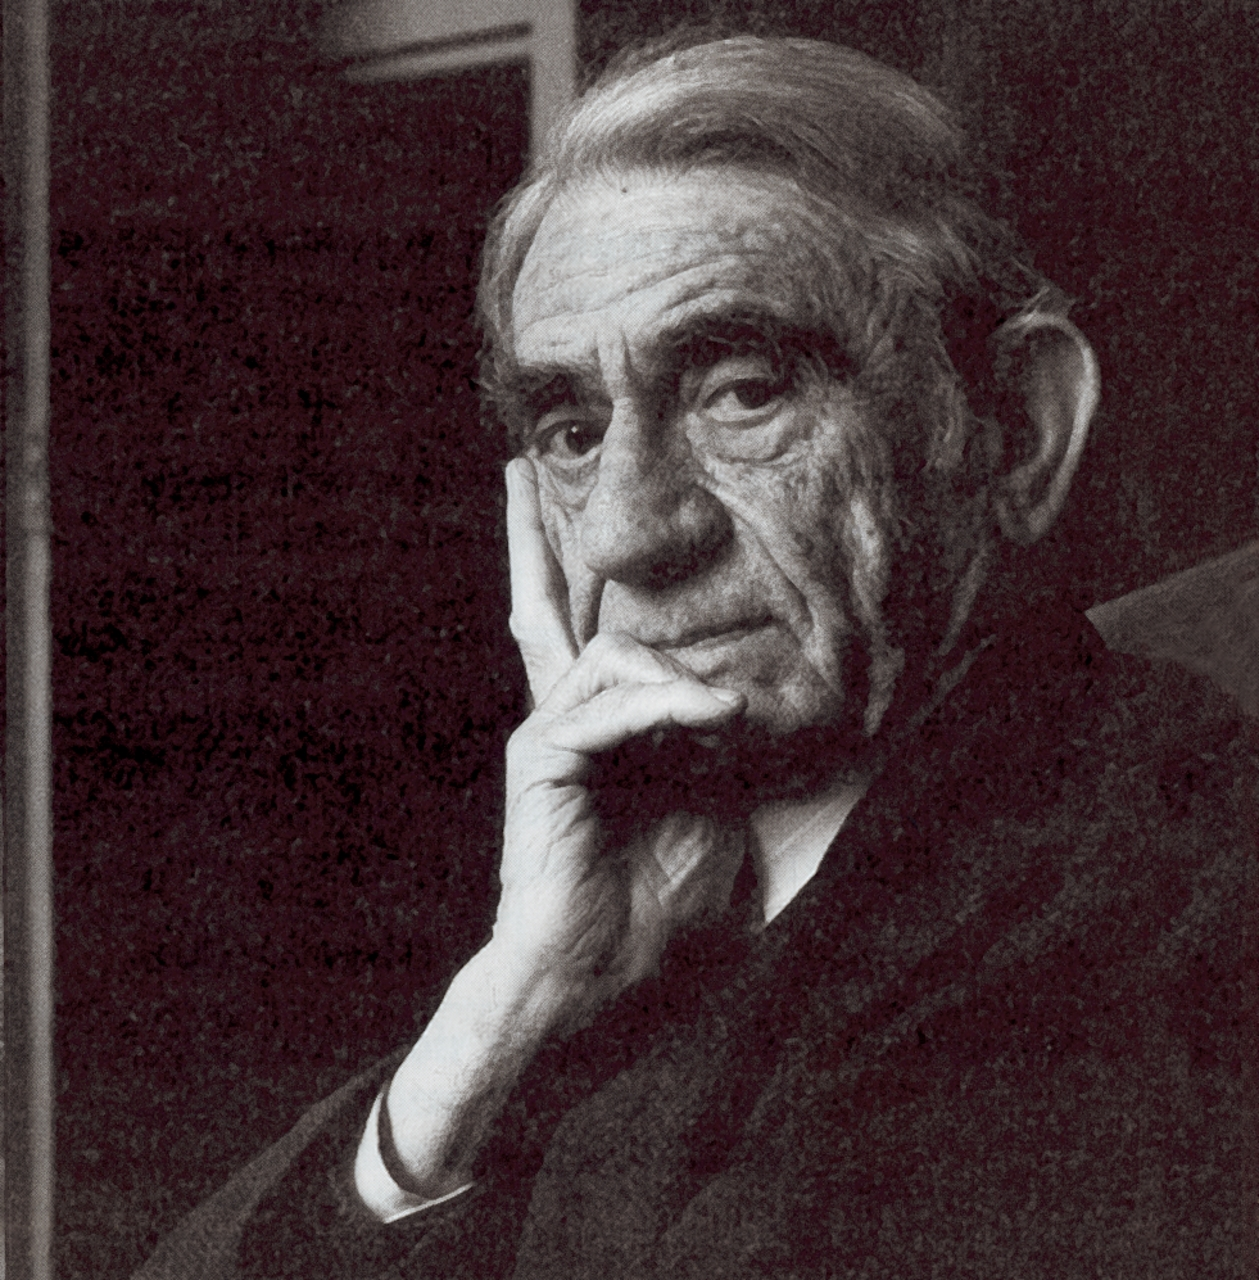 image for Schaeffer, Pierre (1910-1995)